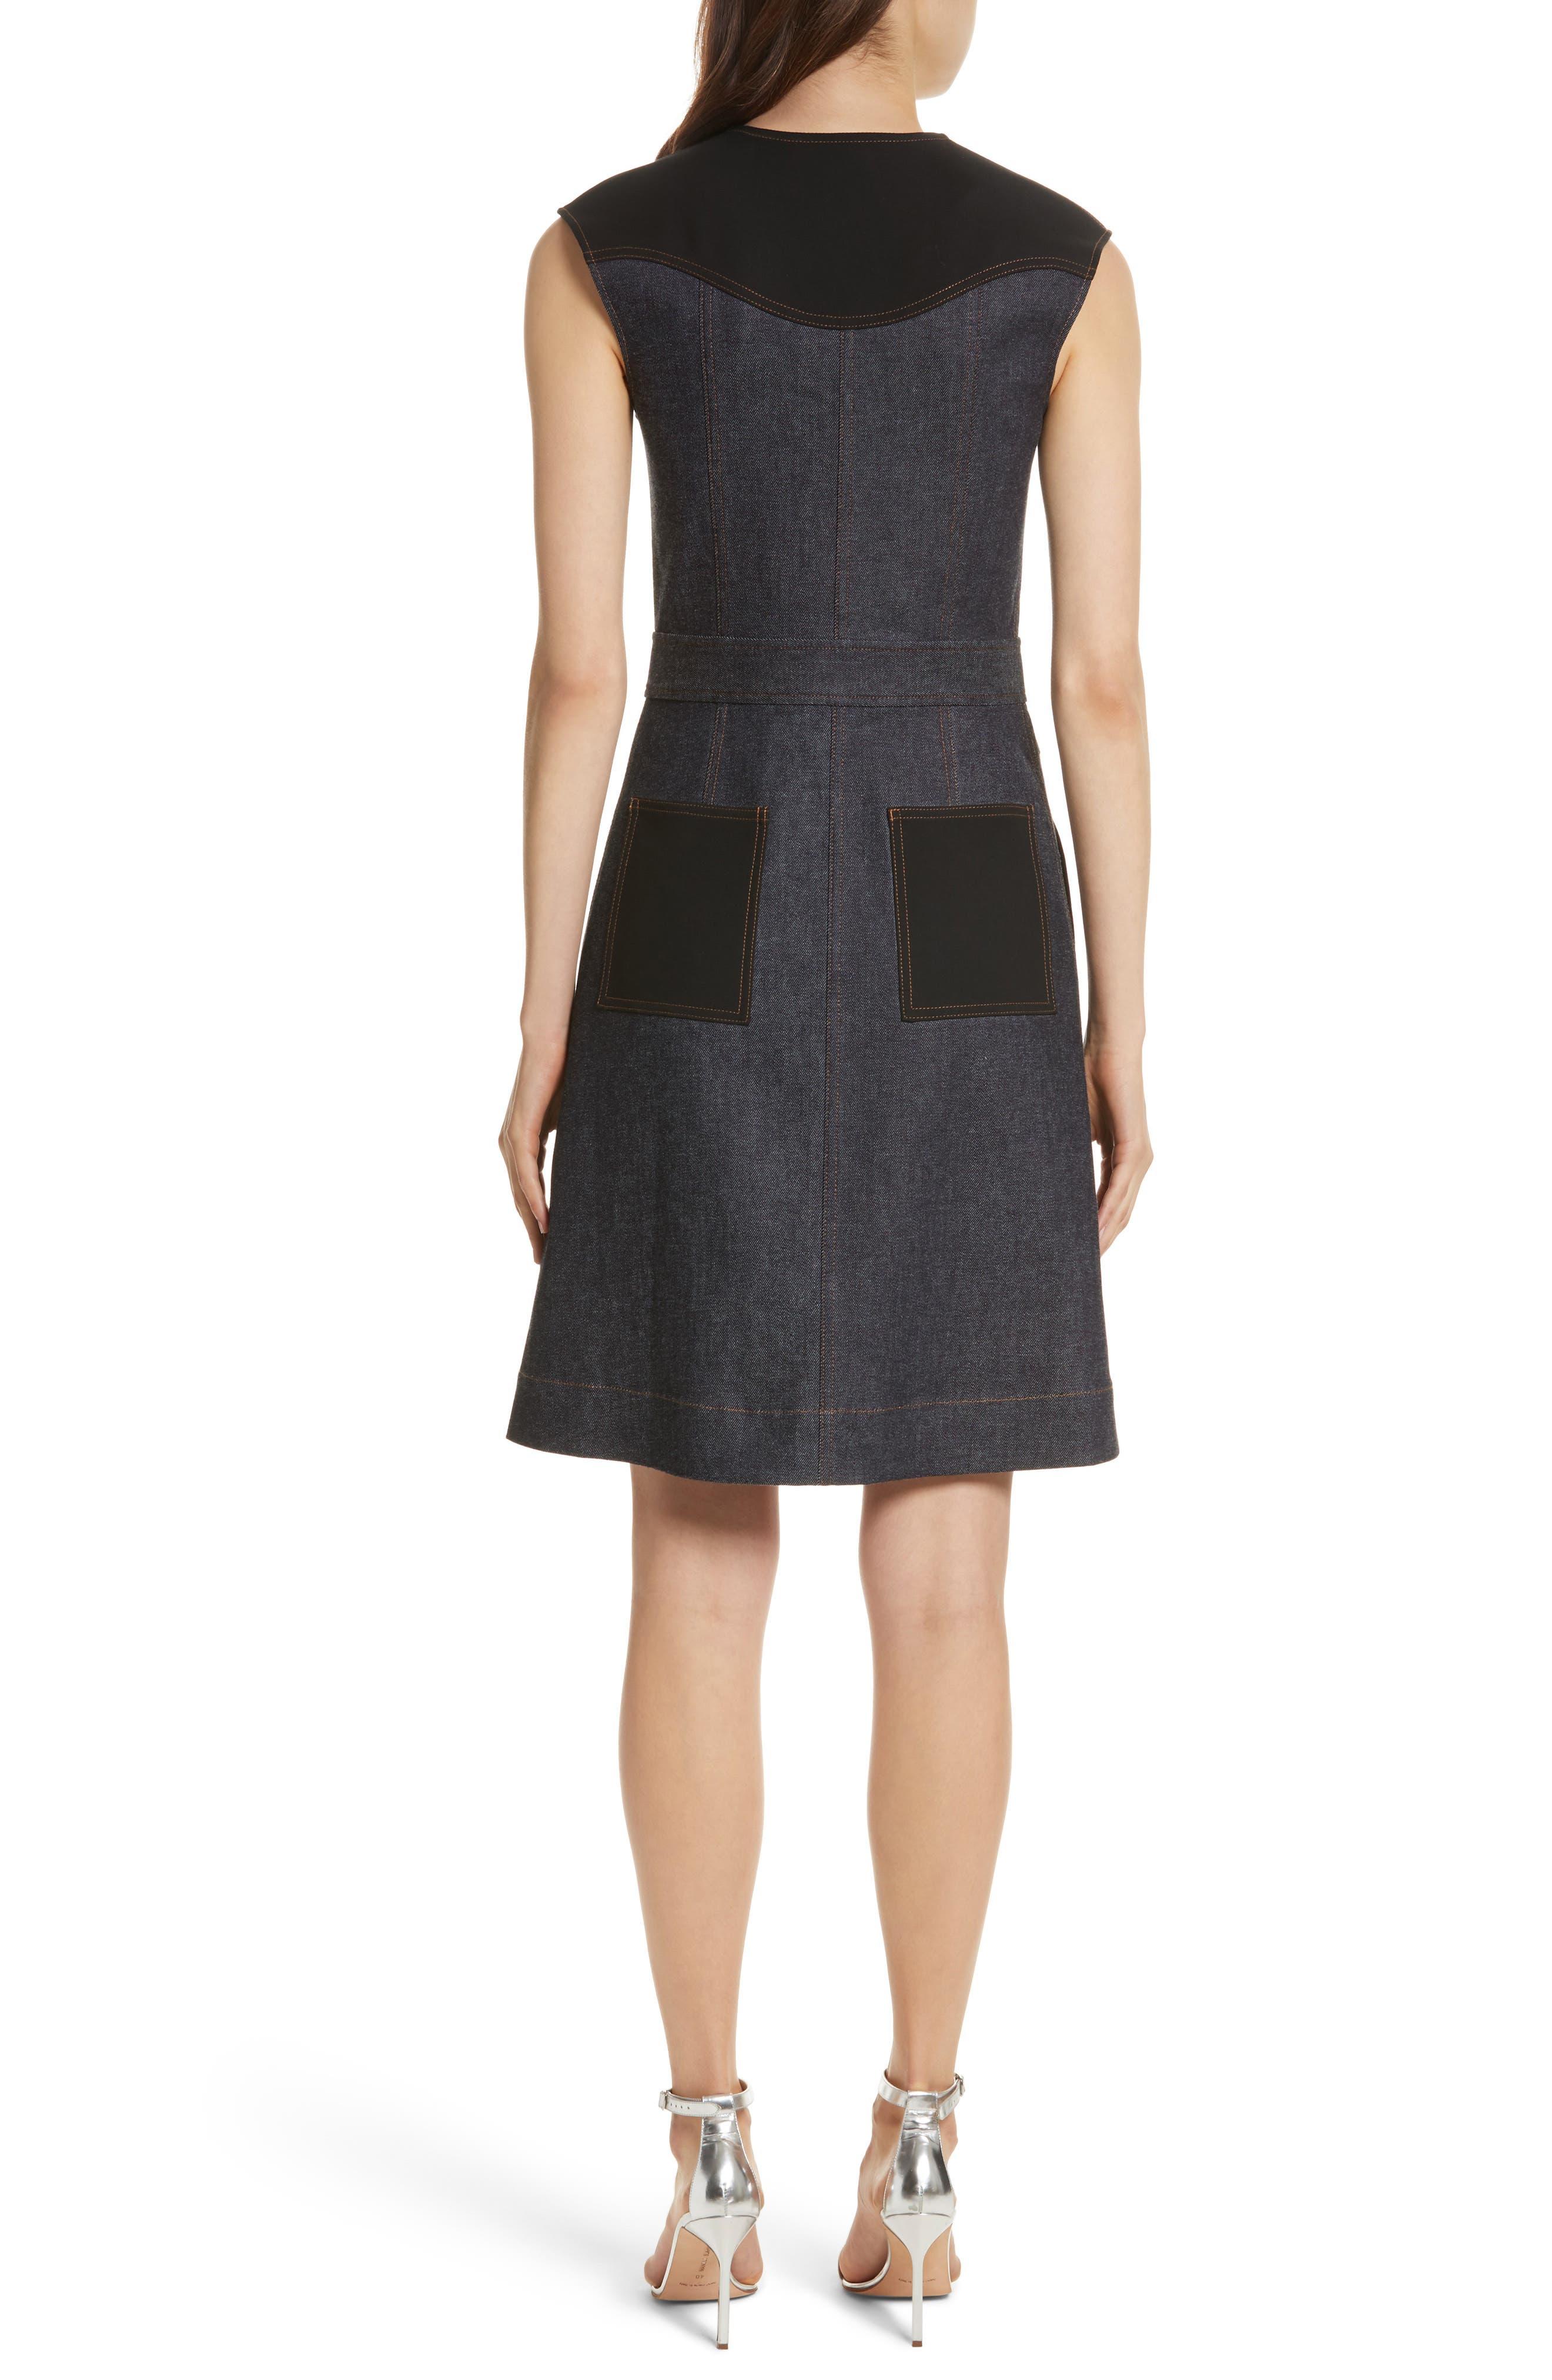 Diane von Furstenberg Front Zip Denim Dress,                             Alternate thumbnail 2, color,